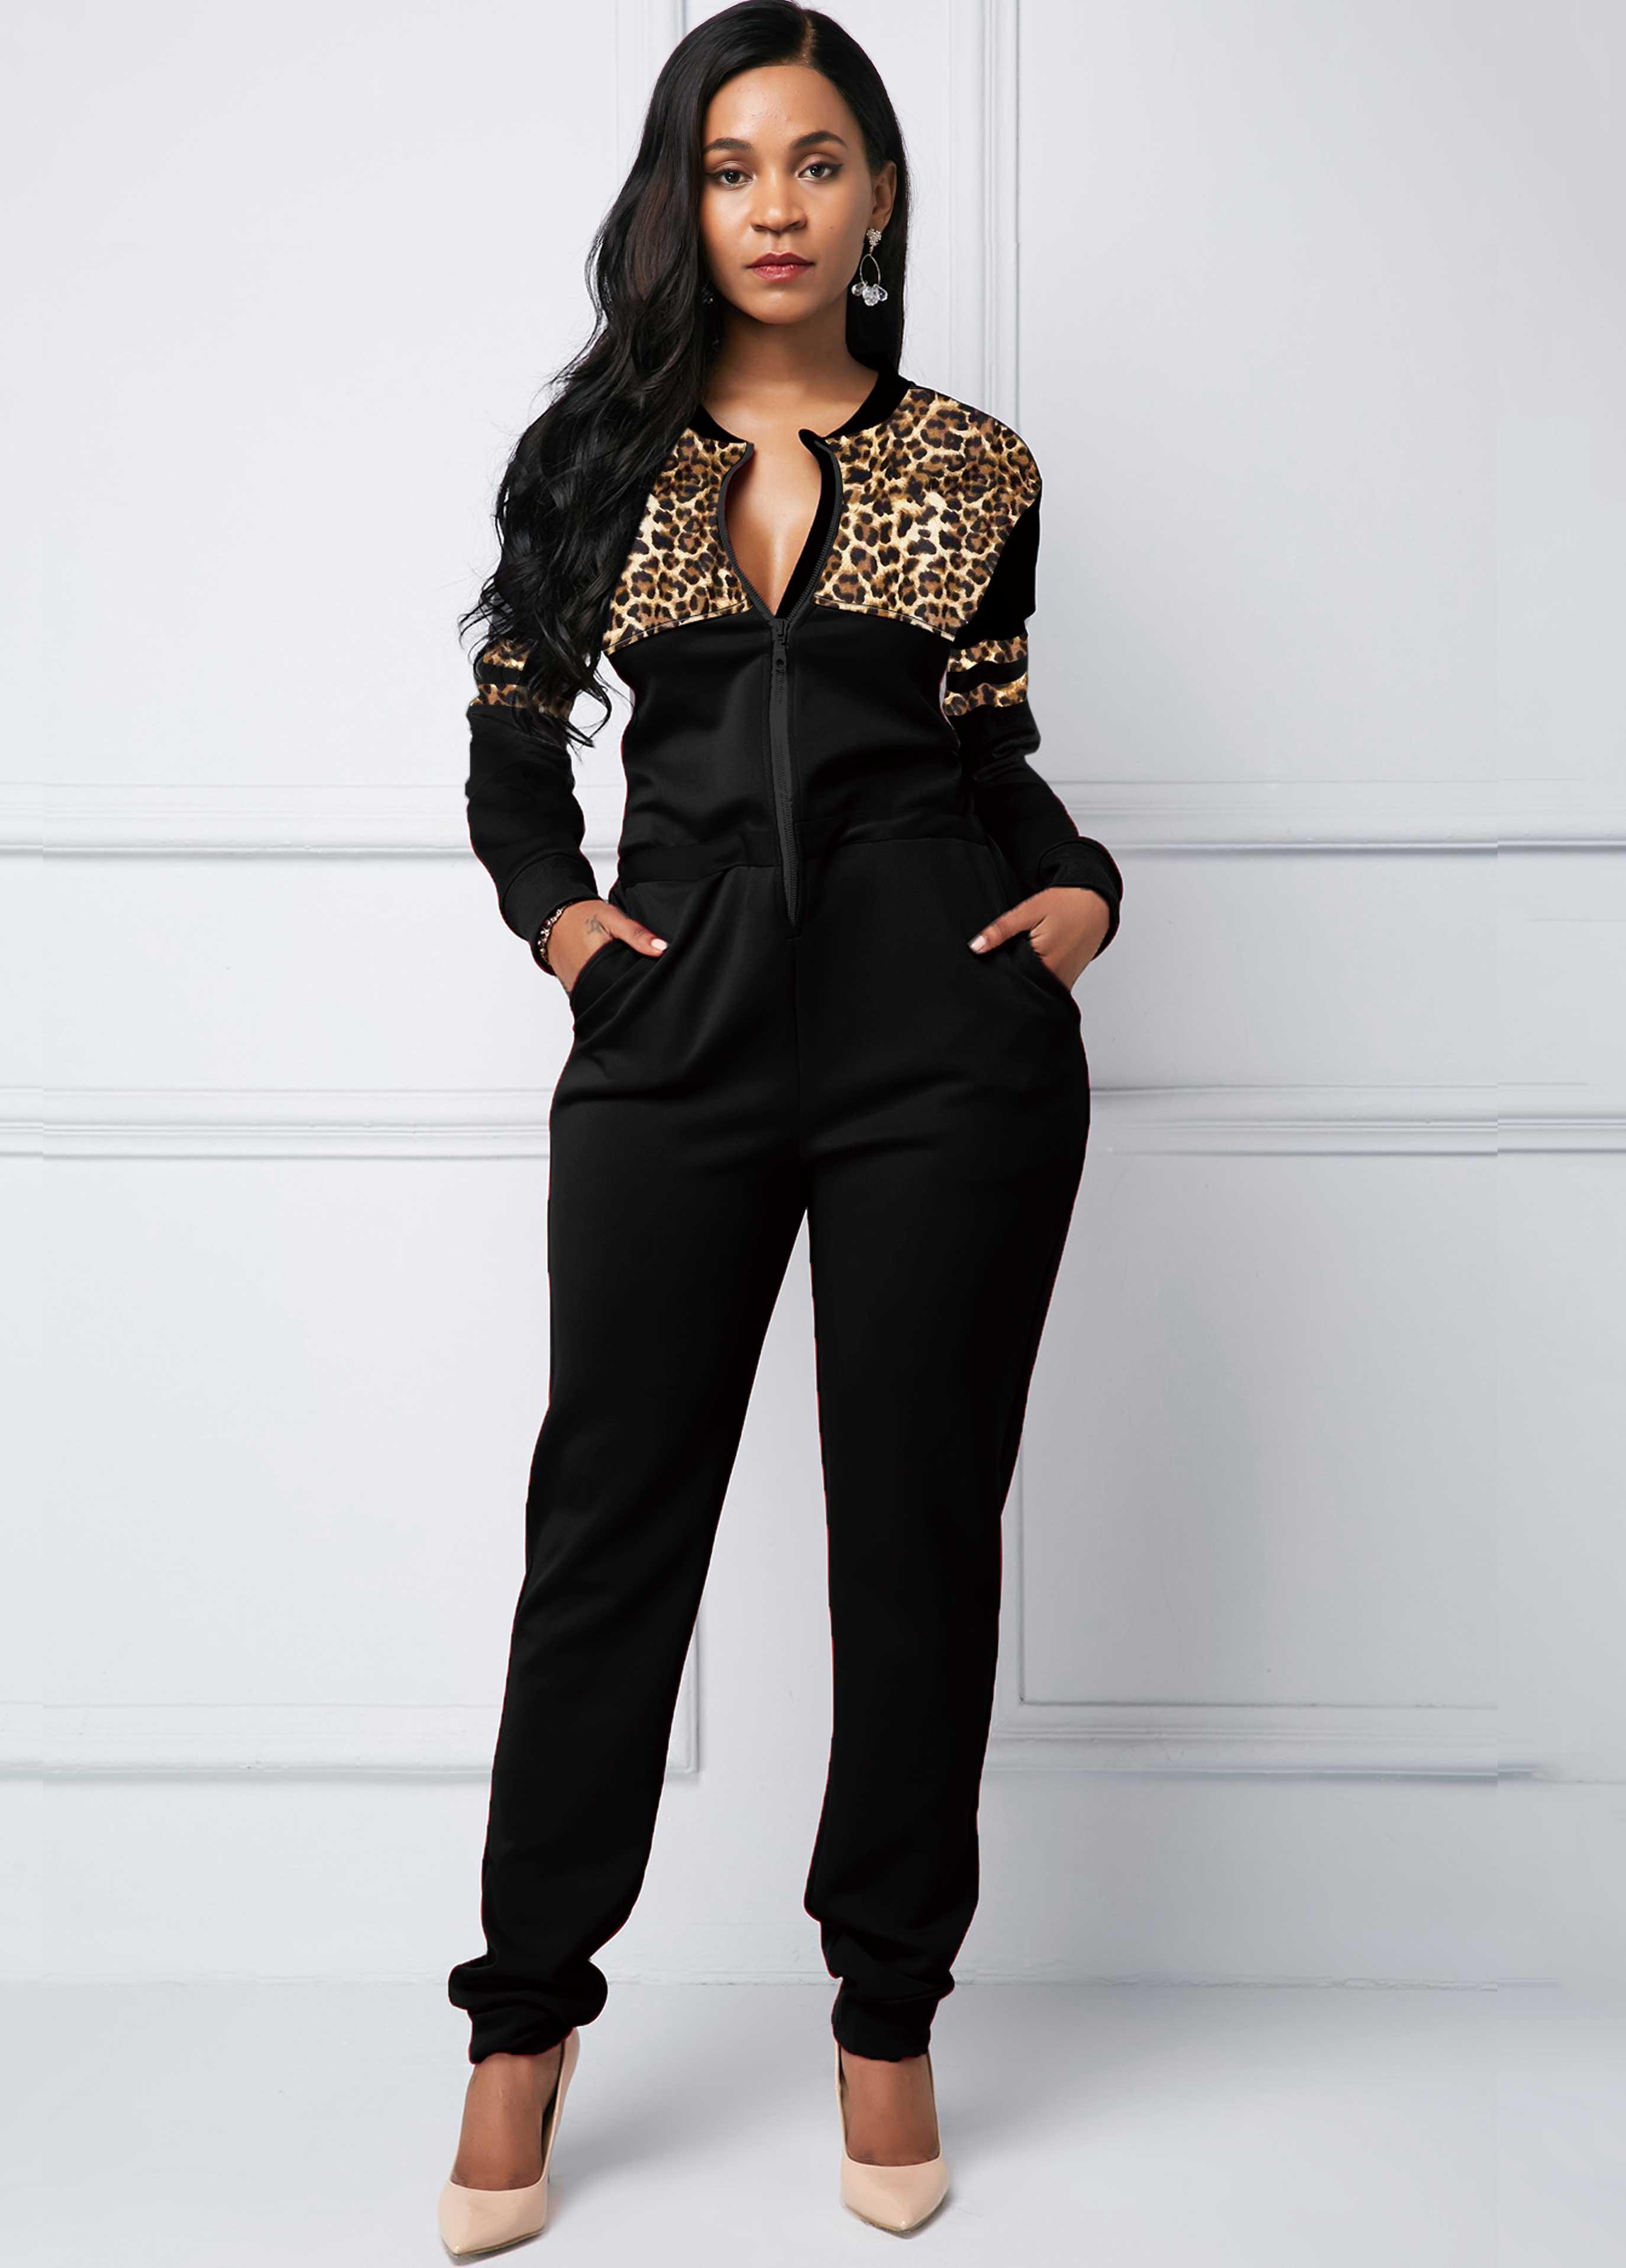 ROTITA Pocket Leopard Print Zipper Closure Jumpsuit